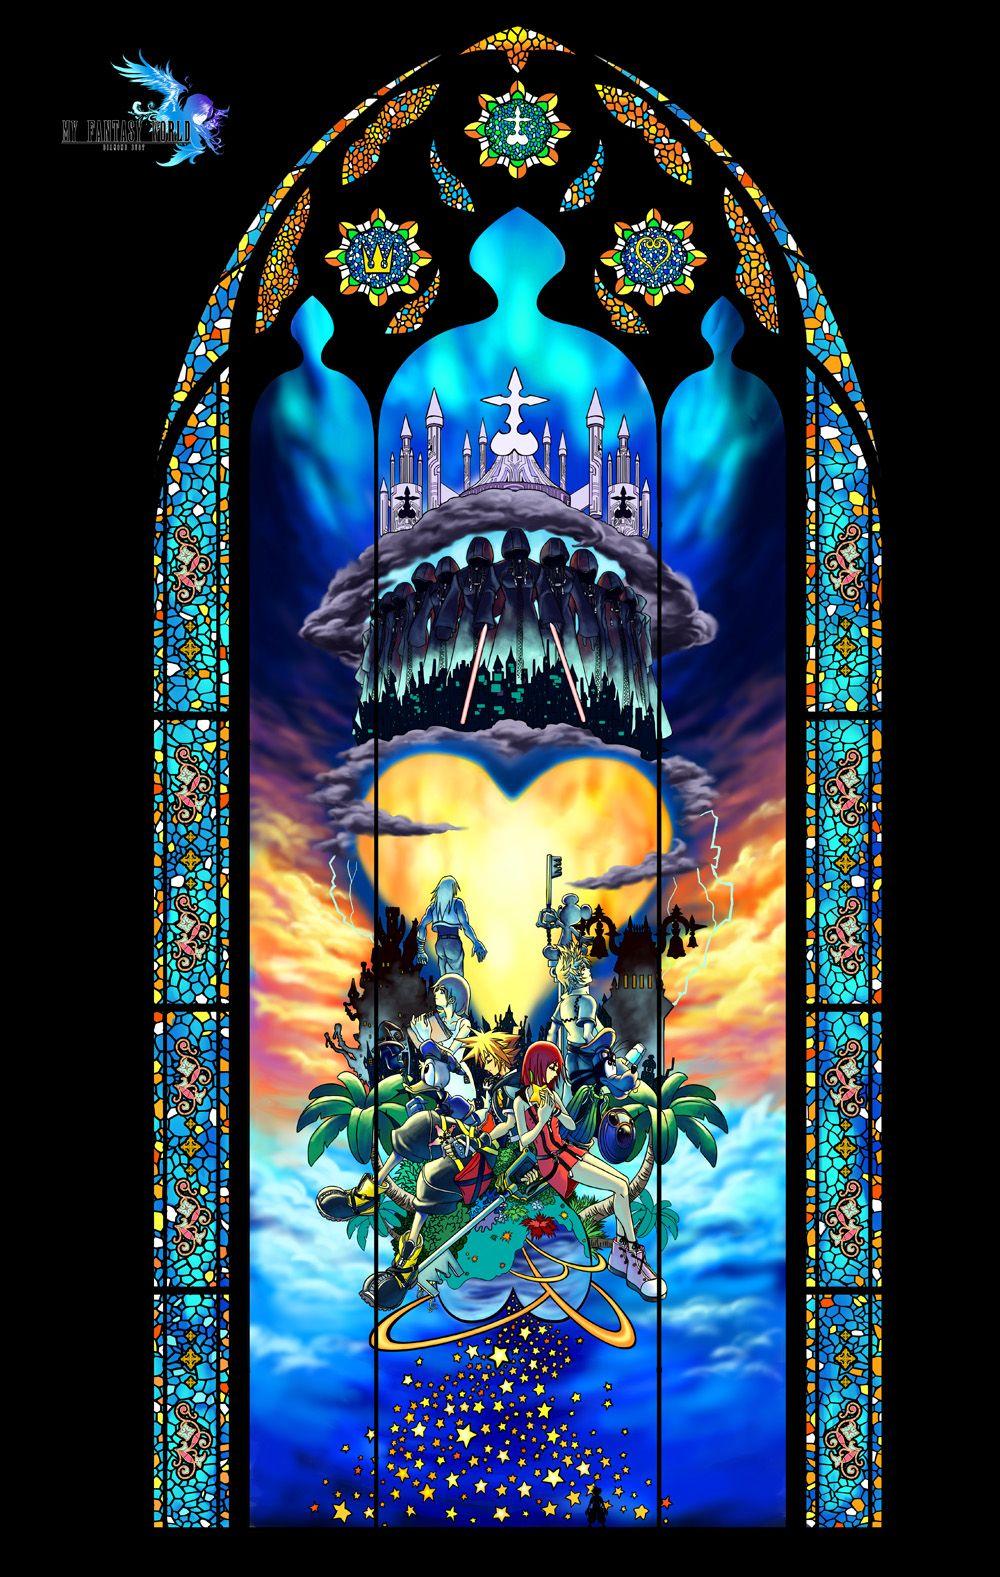 Kingdom Hearts キングダムハーツ 壁紙 キングダムハーツ ステンド